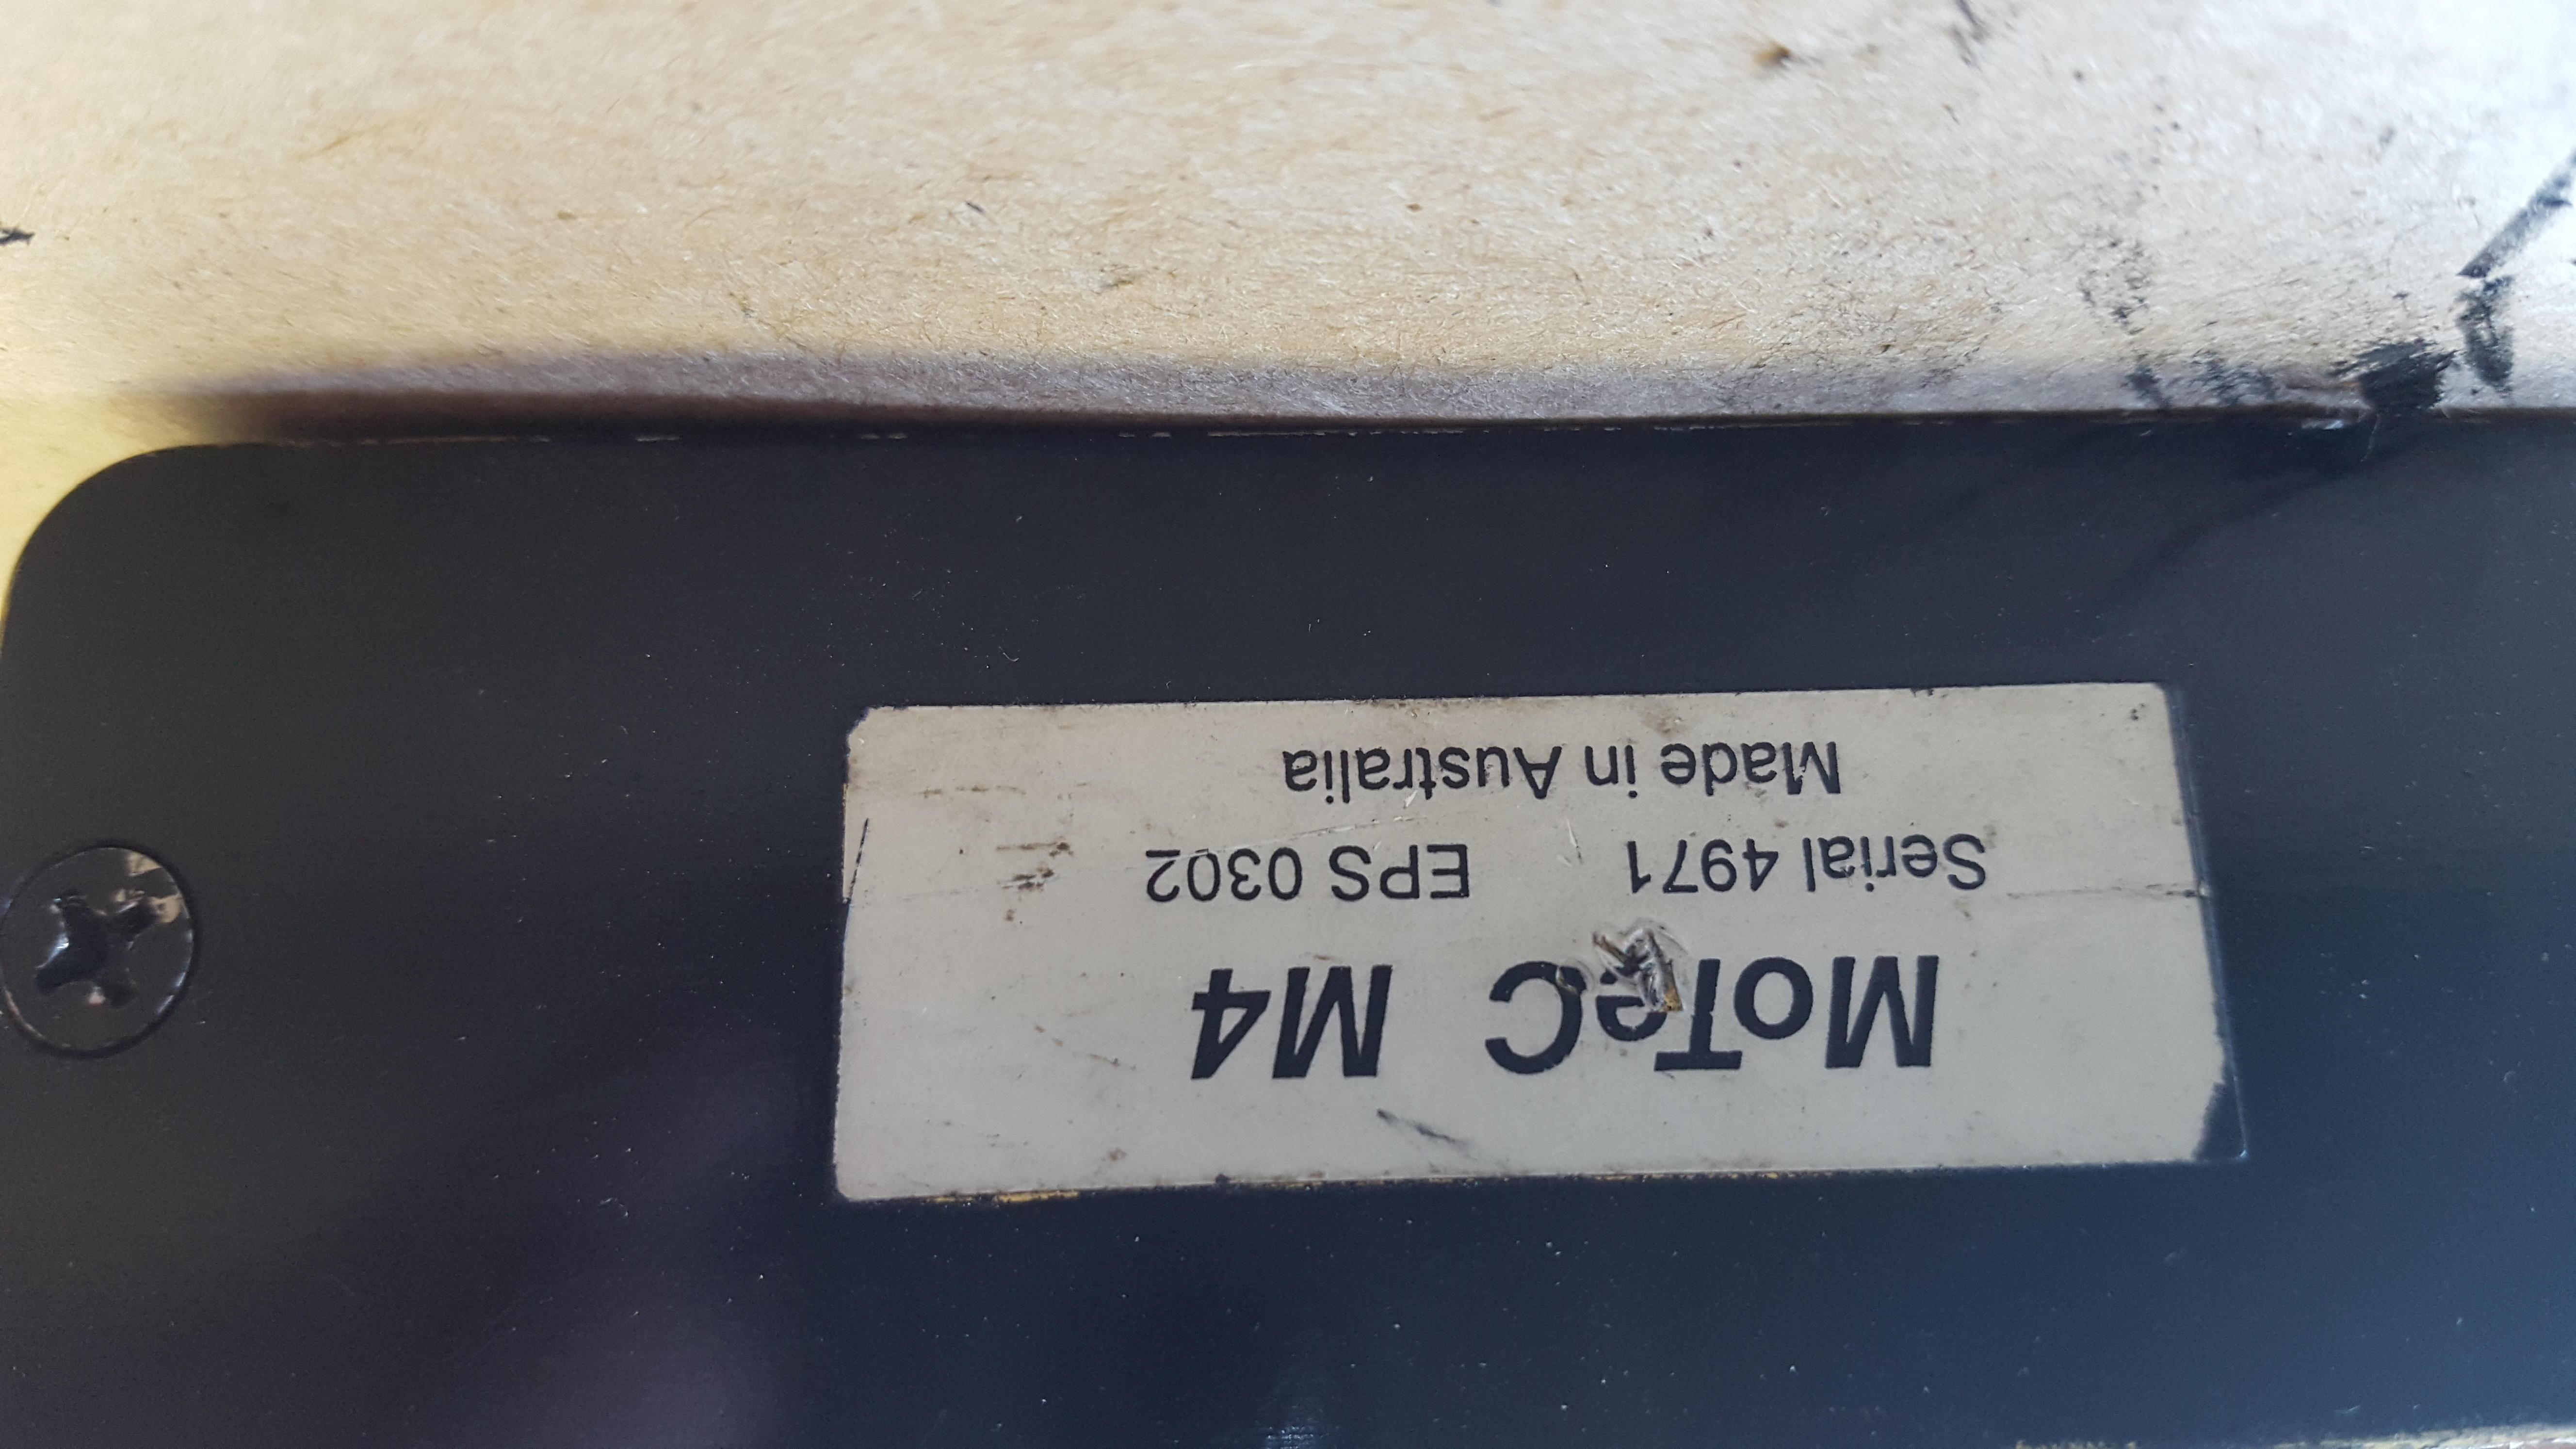 For Sale Motec M4 ECU and Harness - Kawasaki ZX-10R net